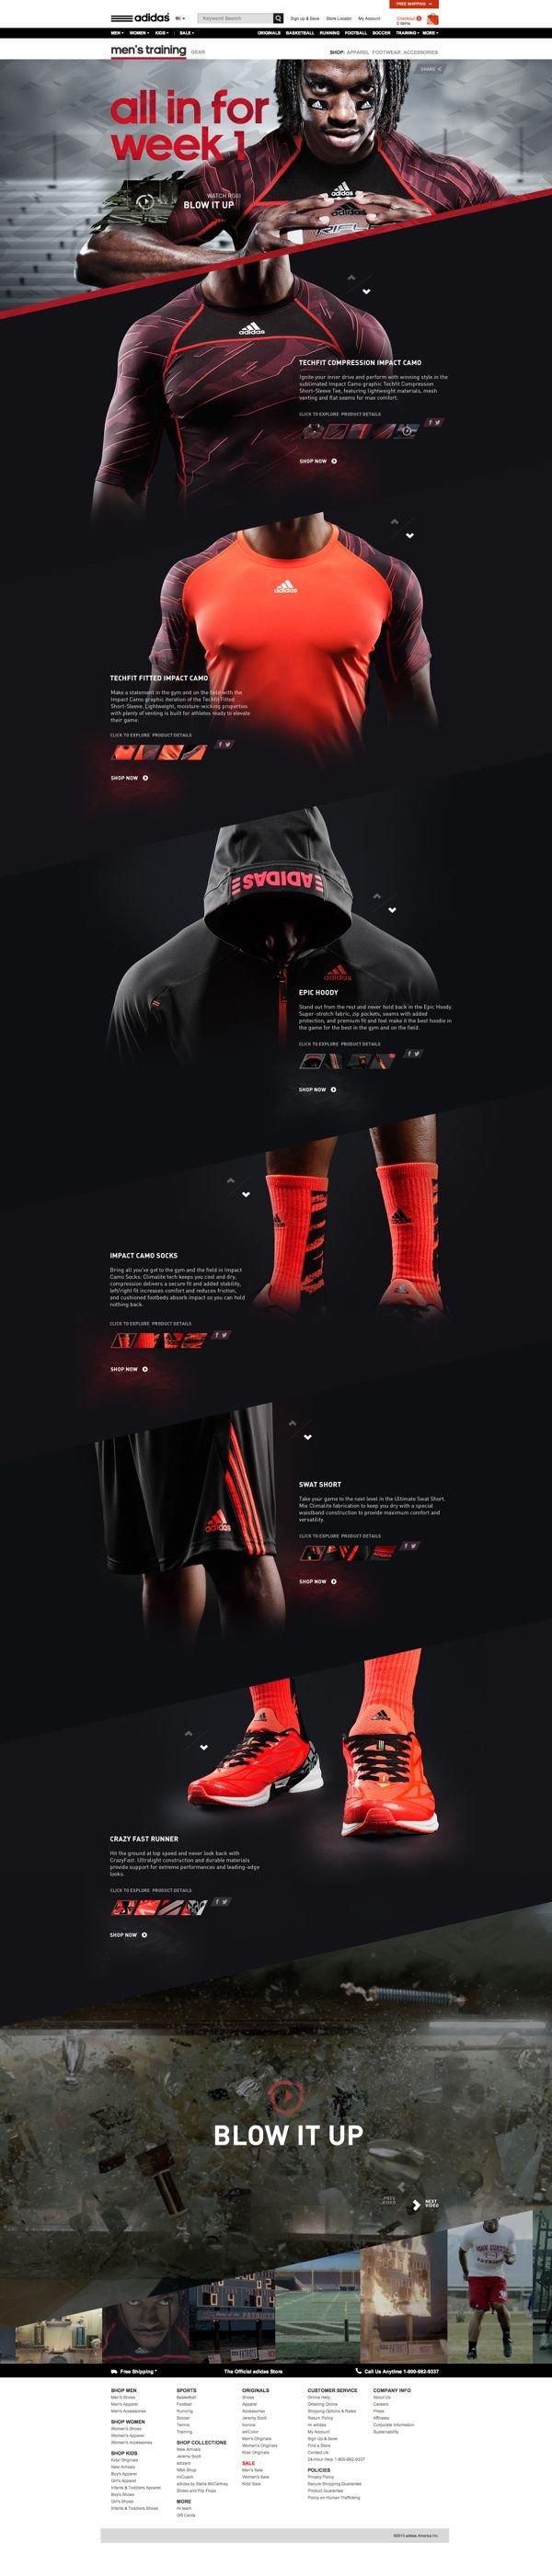 Unique Web Design, Adidas via @Kin Nirov